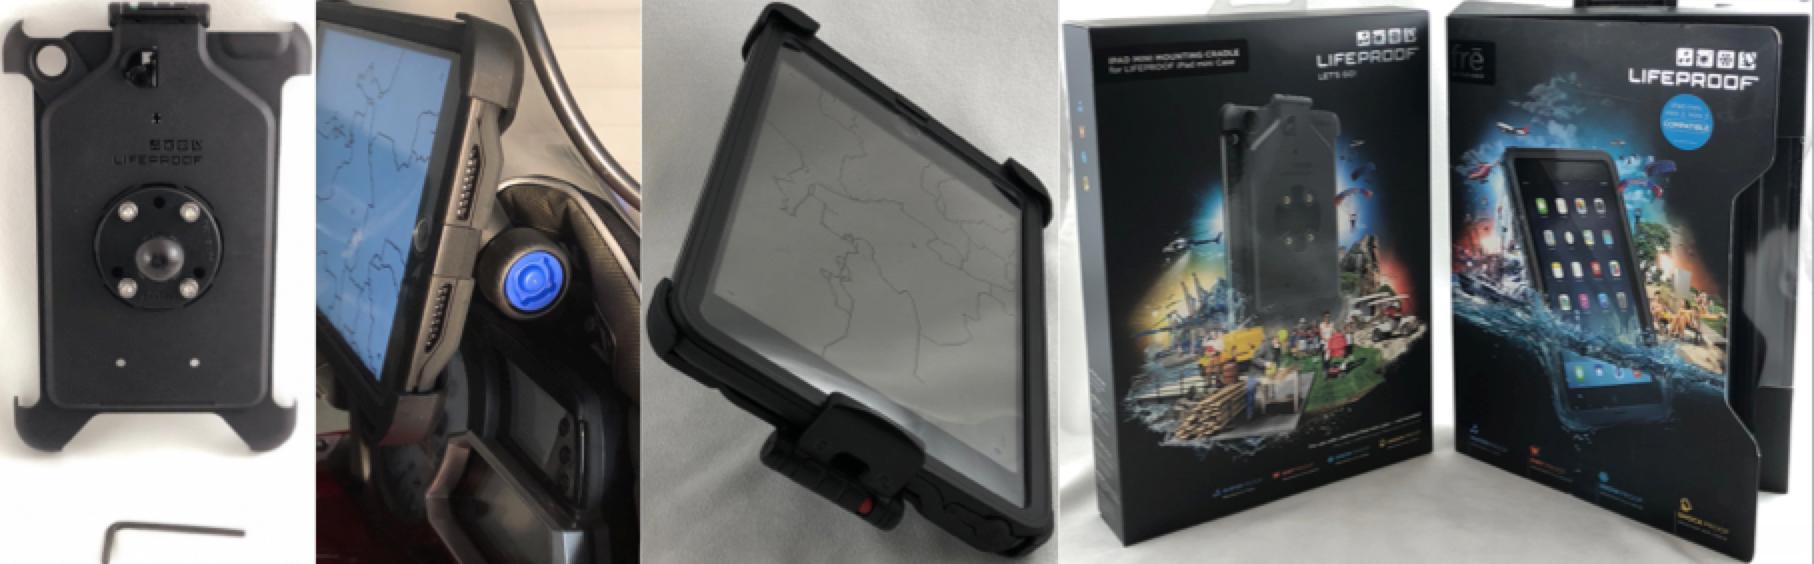 LifeProof iPad Mini  locking MOUNTING CRADLE  and FRĒ CASE  FOR iPAD MINI wifi+ cellular series 1, 2, 3